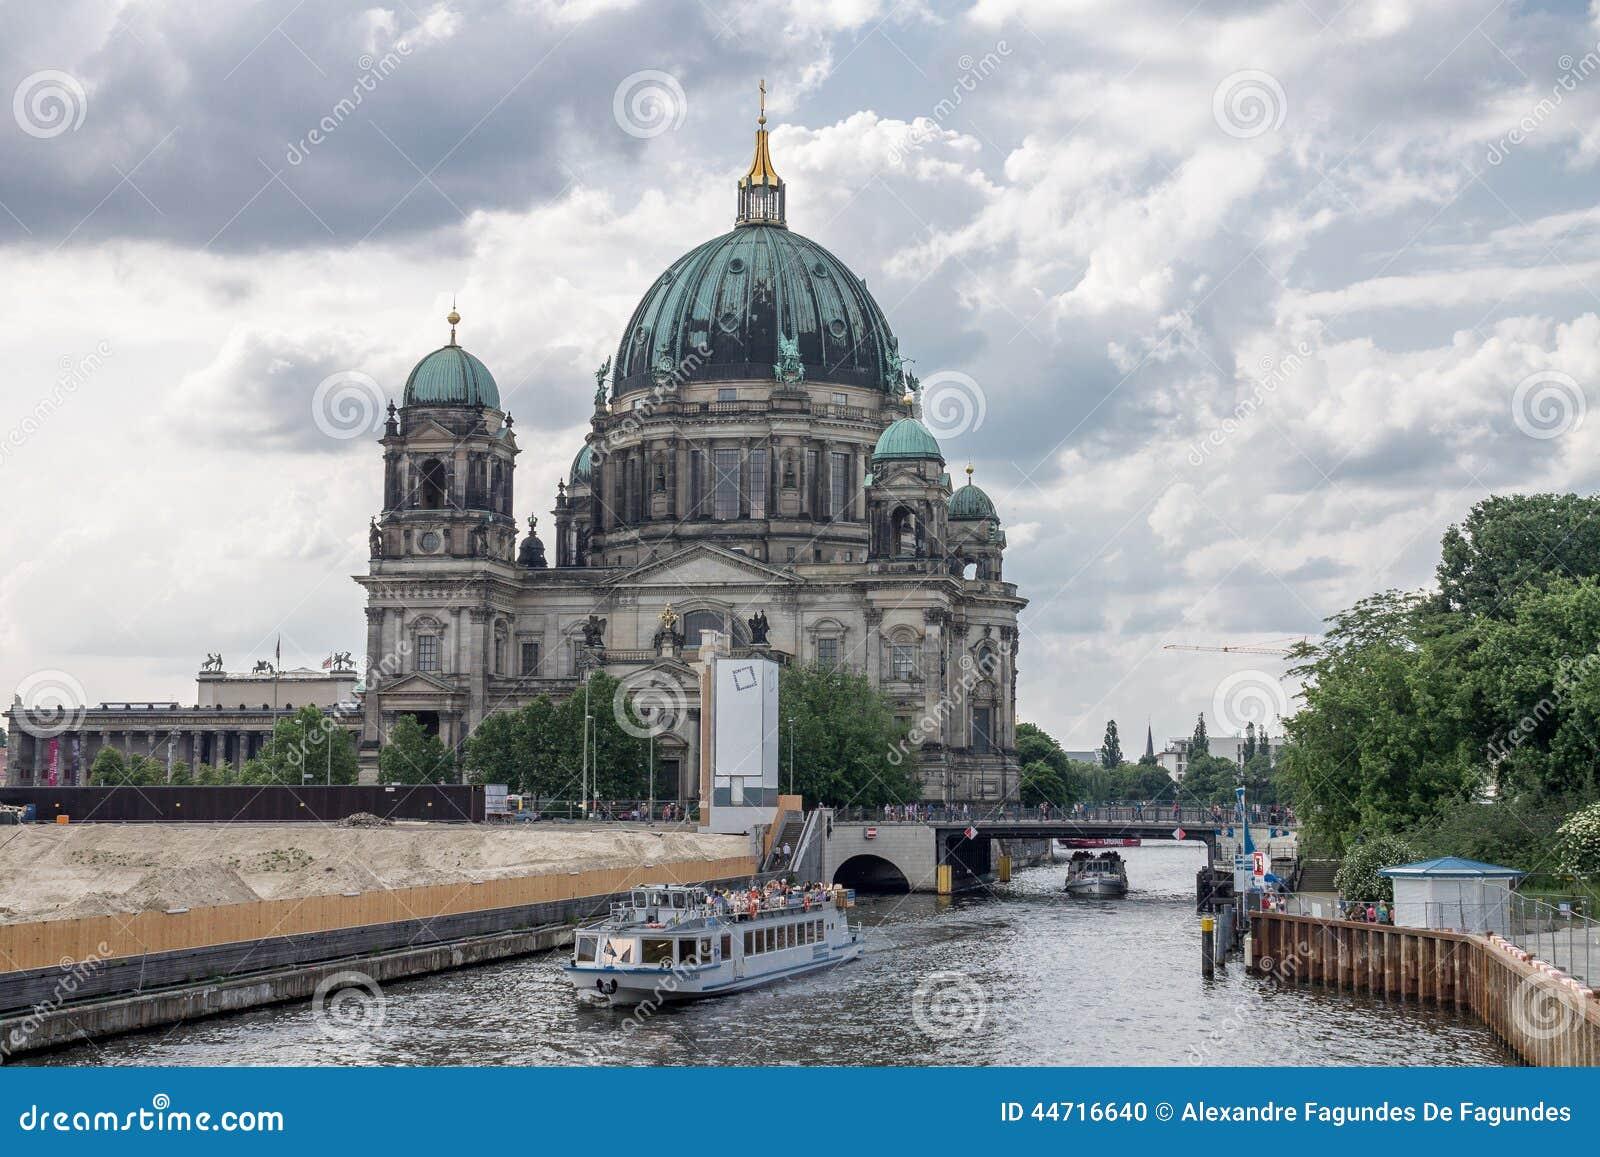 berlin cathedral editorial image image 44716640. Black Bedroom Furniture Sets. Home Design Ideas